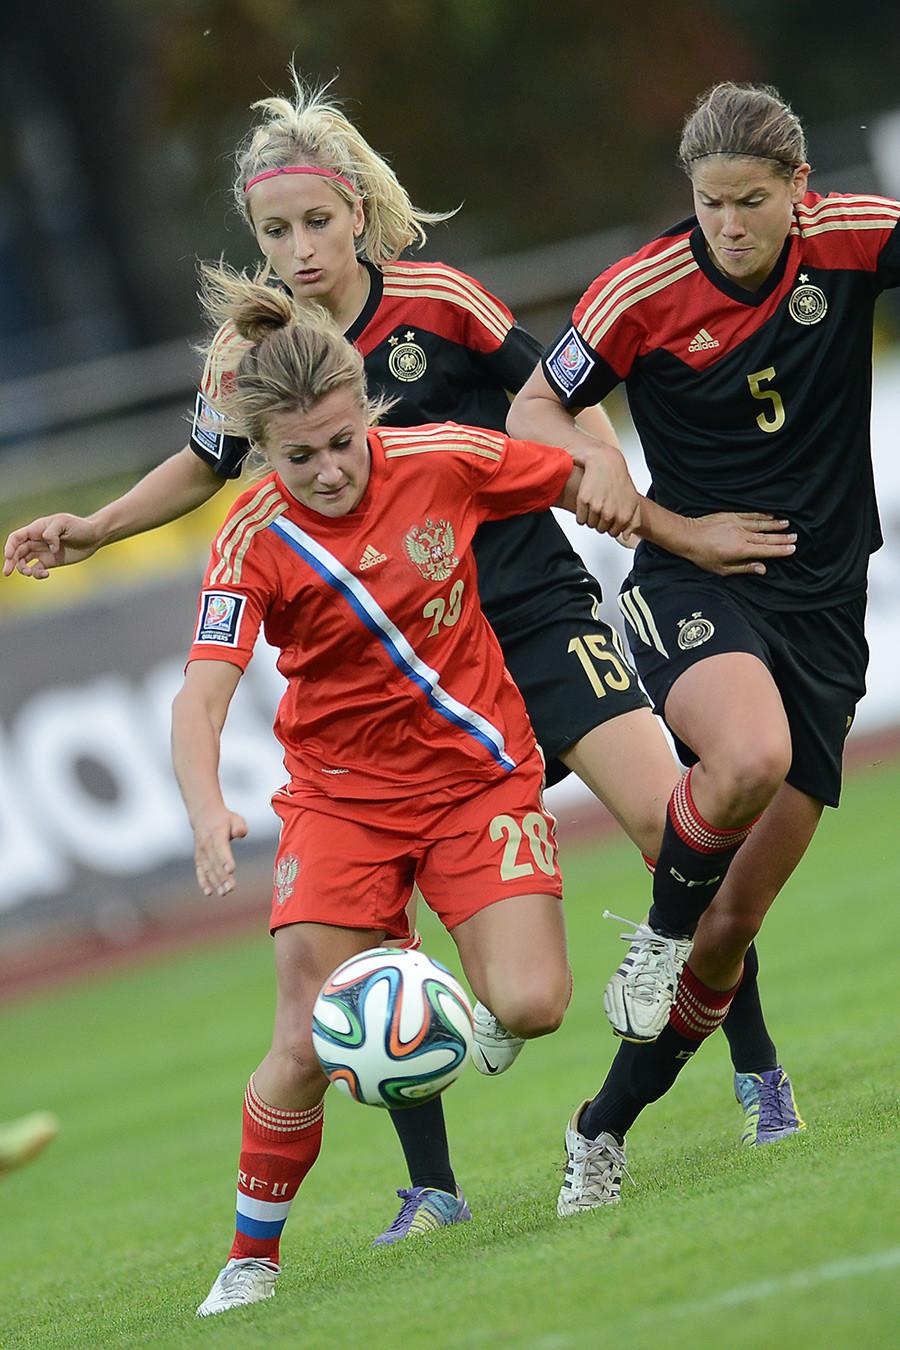 Pertandingan Rusia vs Jerman dalam Kualifikasi Piala Dunia Wanita 2015.